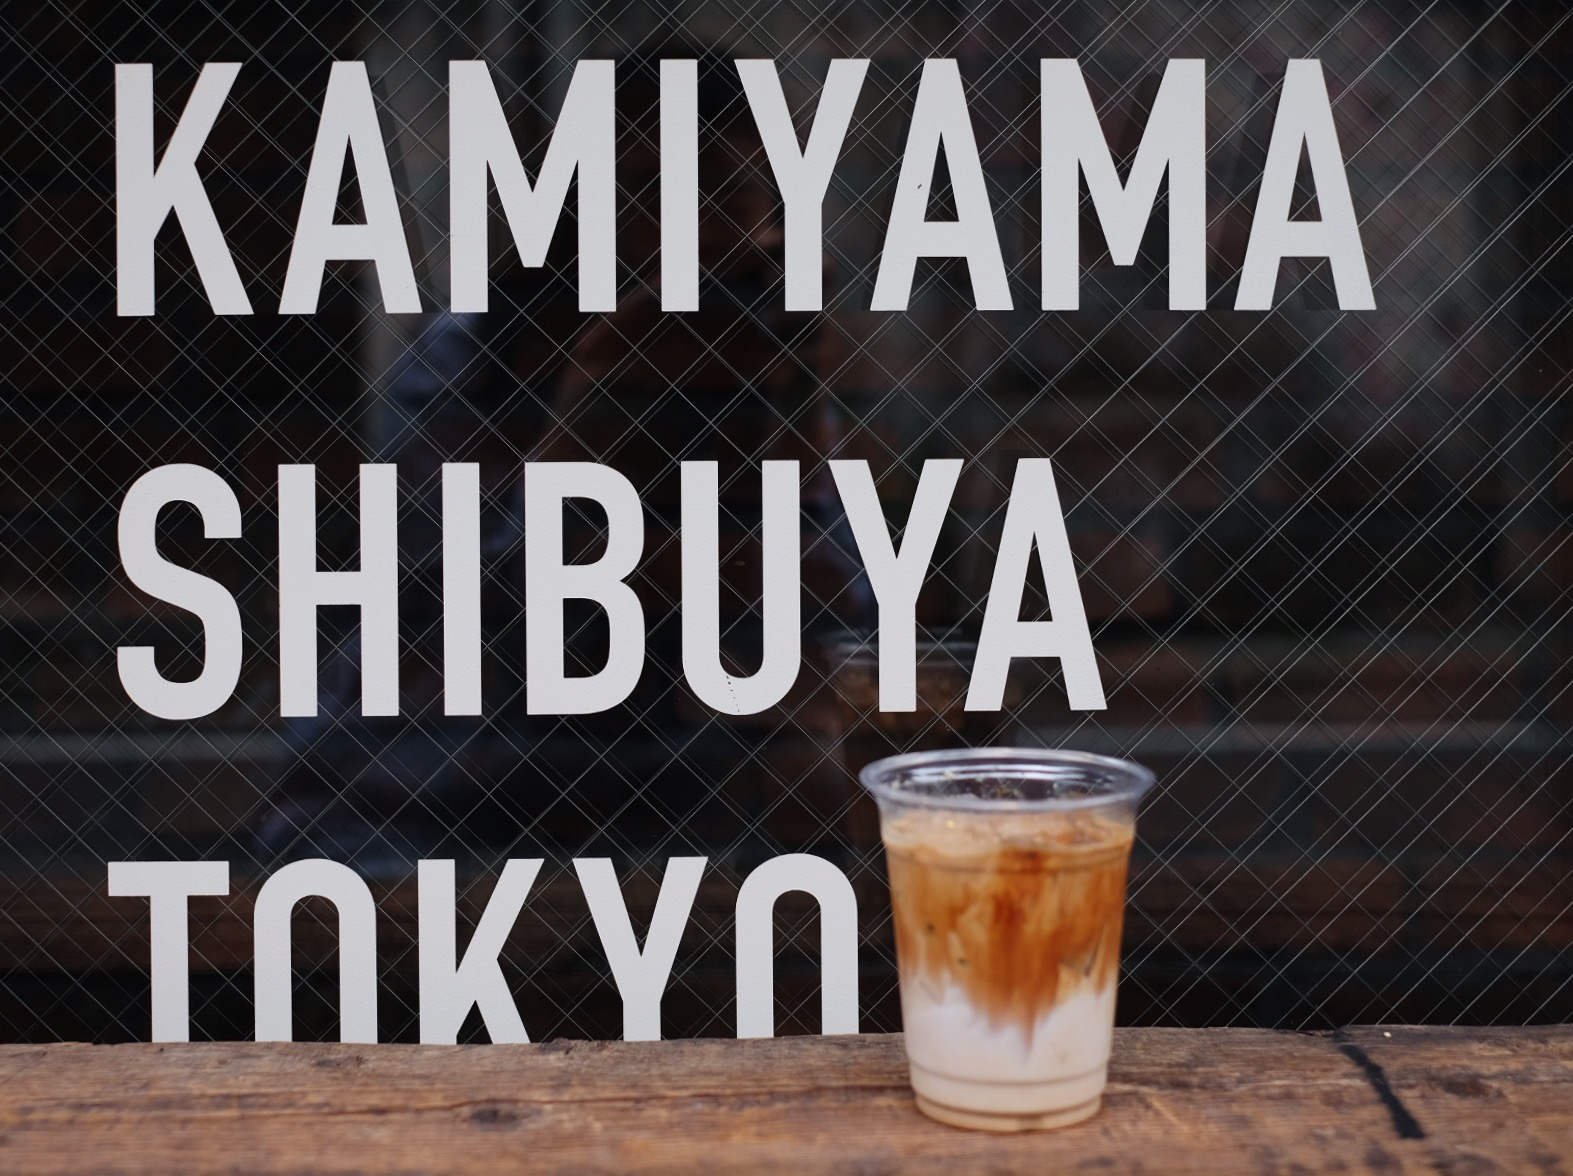 Camelback Coffee  , my favorite coffee spot in Shibuya.